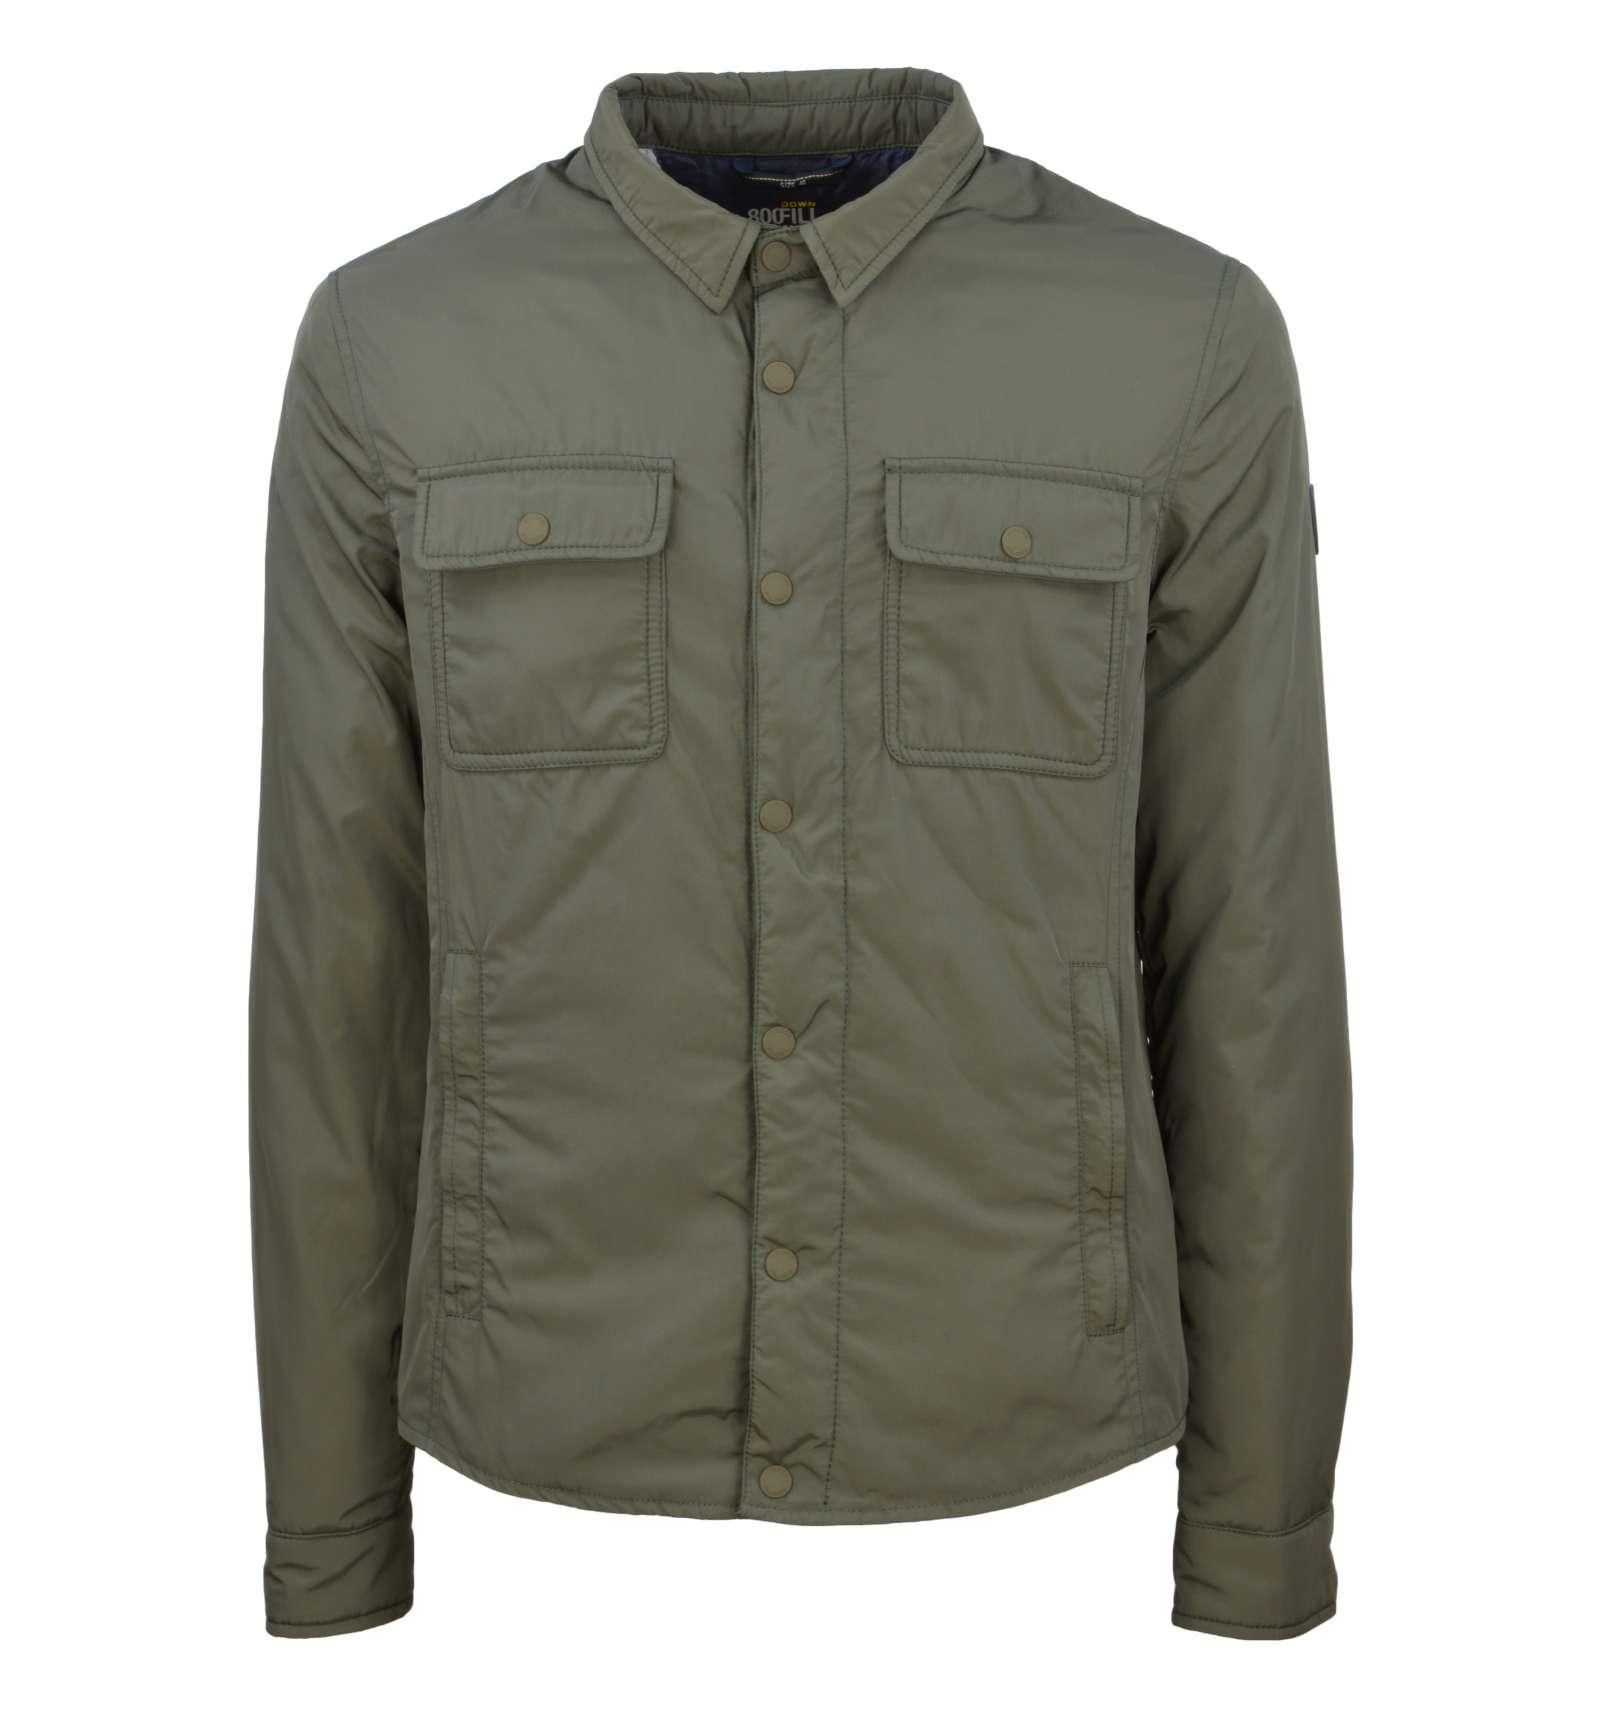 CIESSE PIUMINI uomo giacca piumino estivo verde VINCENT 401HXP 5b6d2b5a6eb